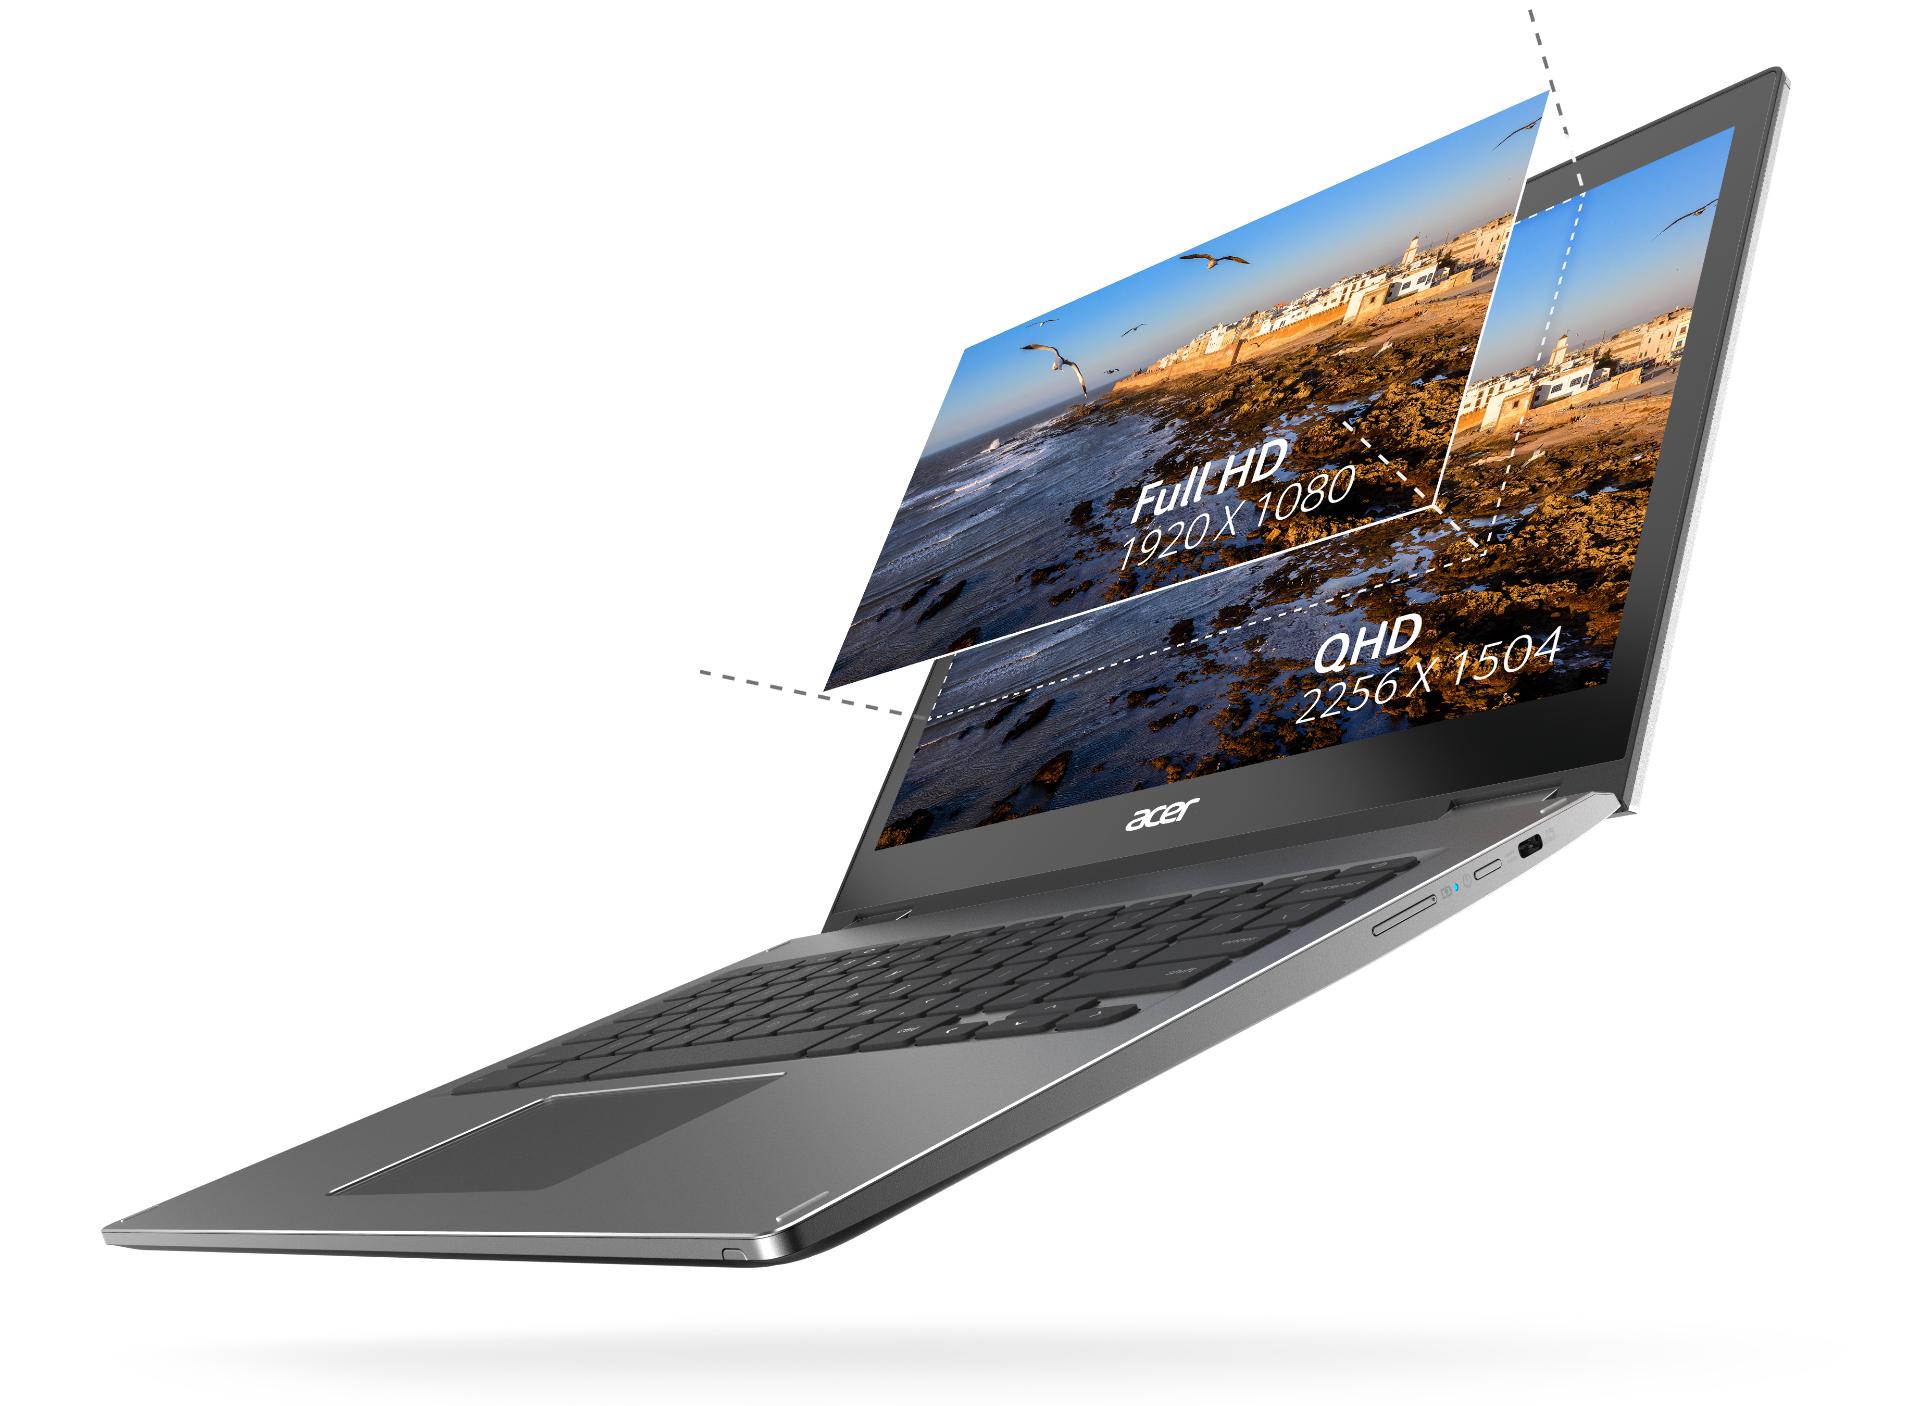 Acer Chromebook Spin 13 - Sharp Images - Large